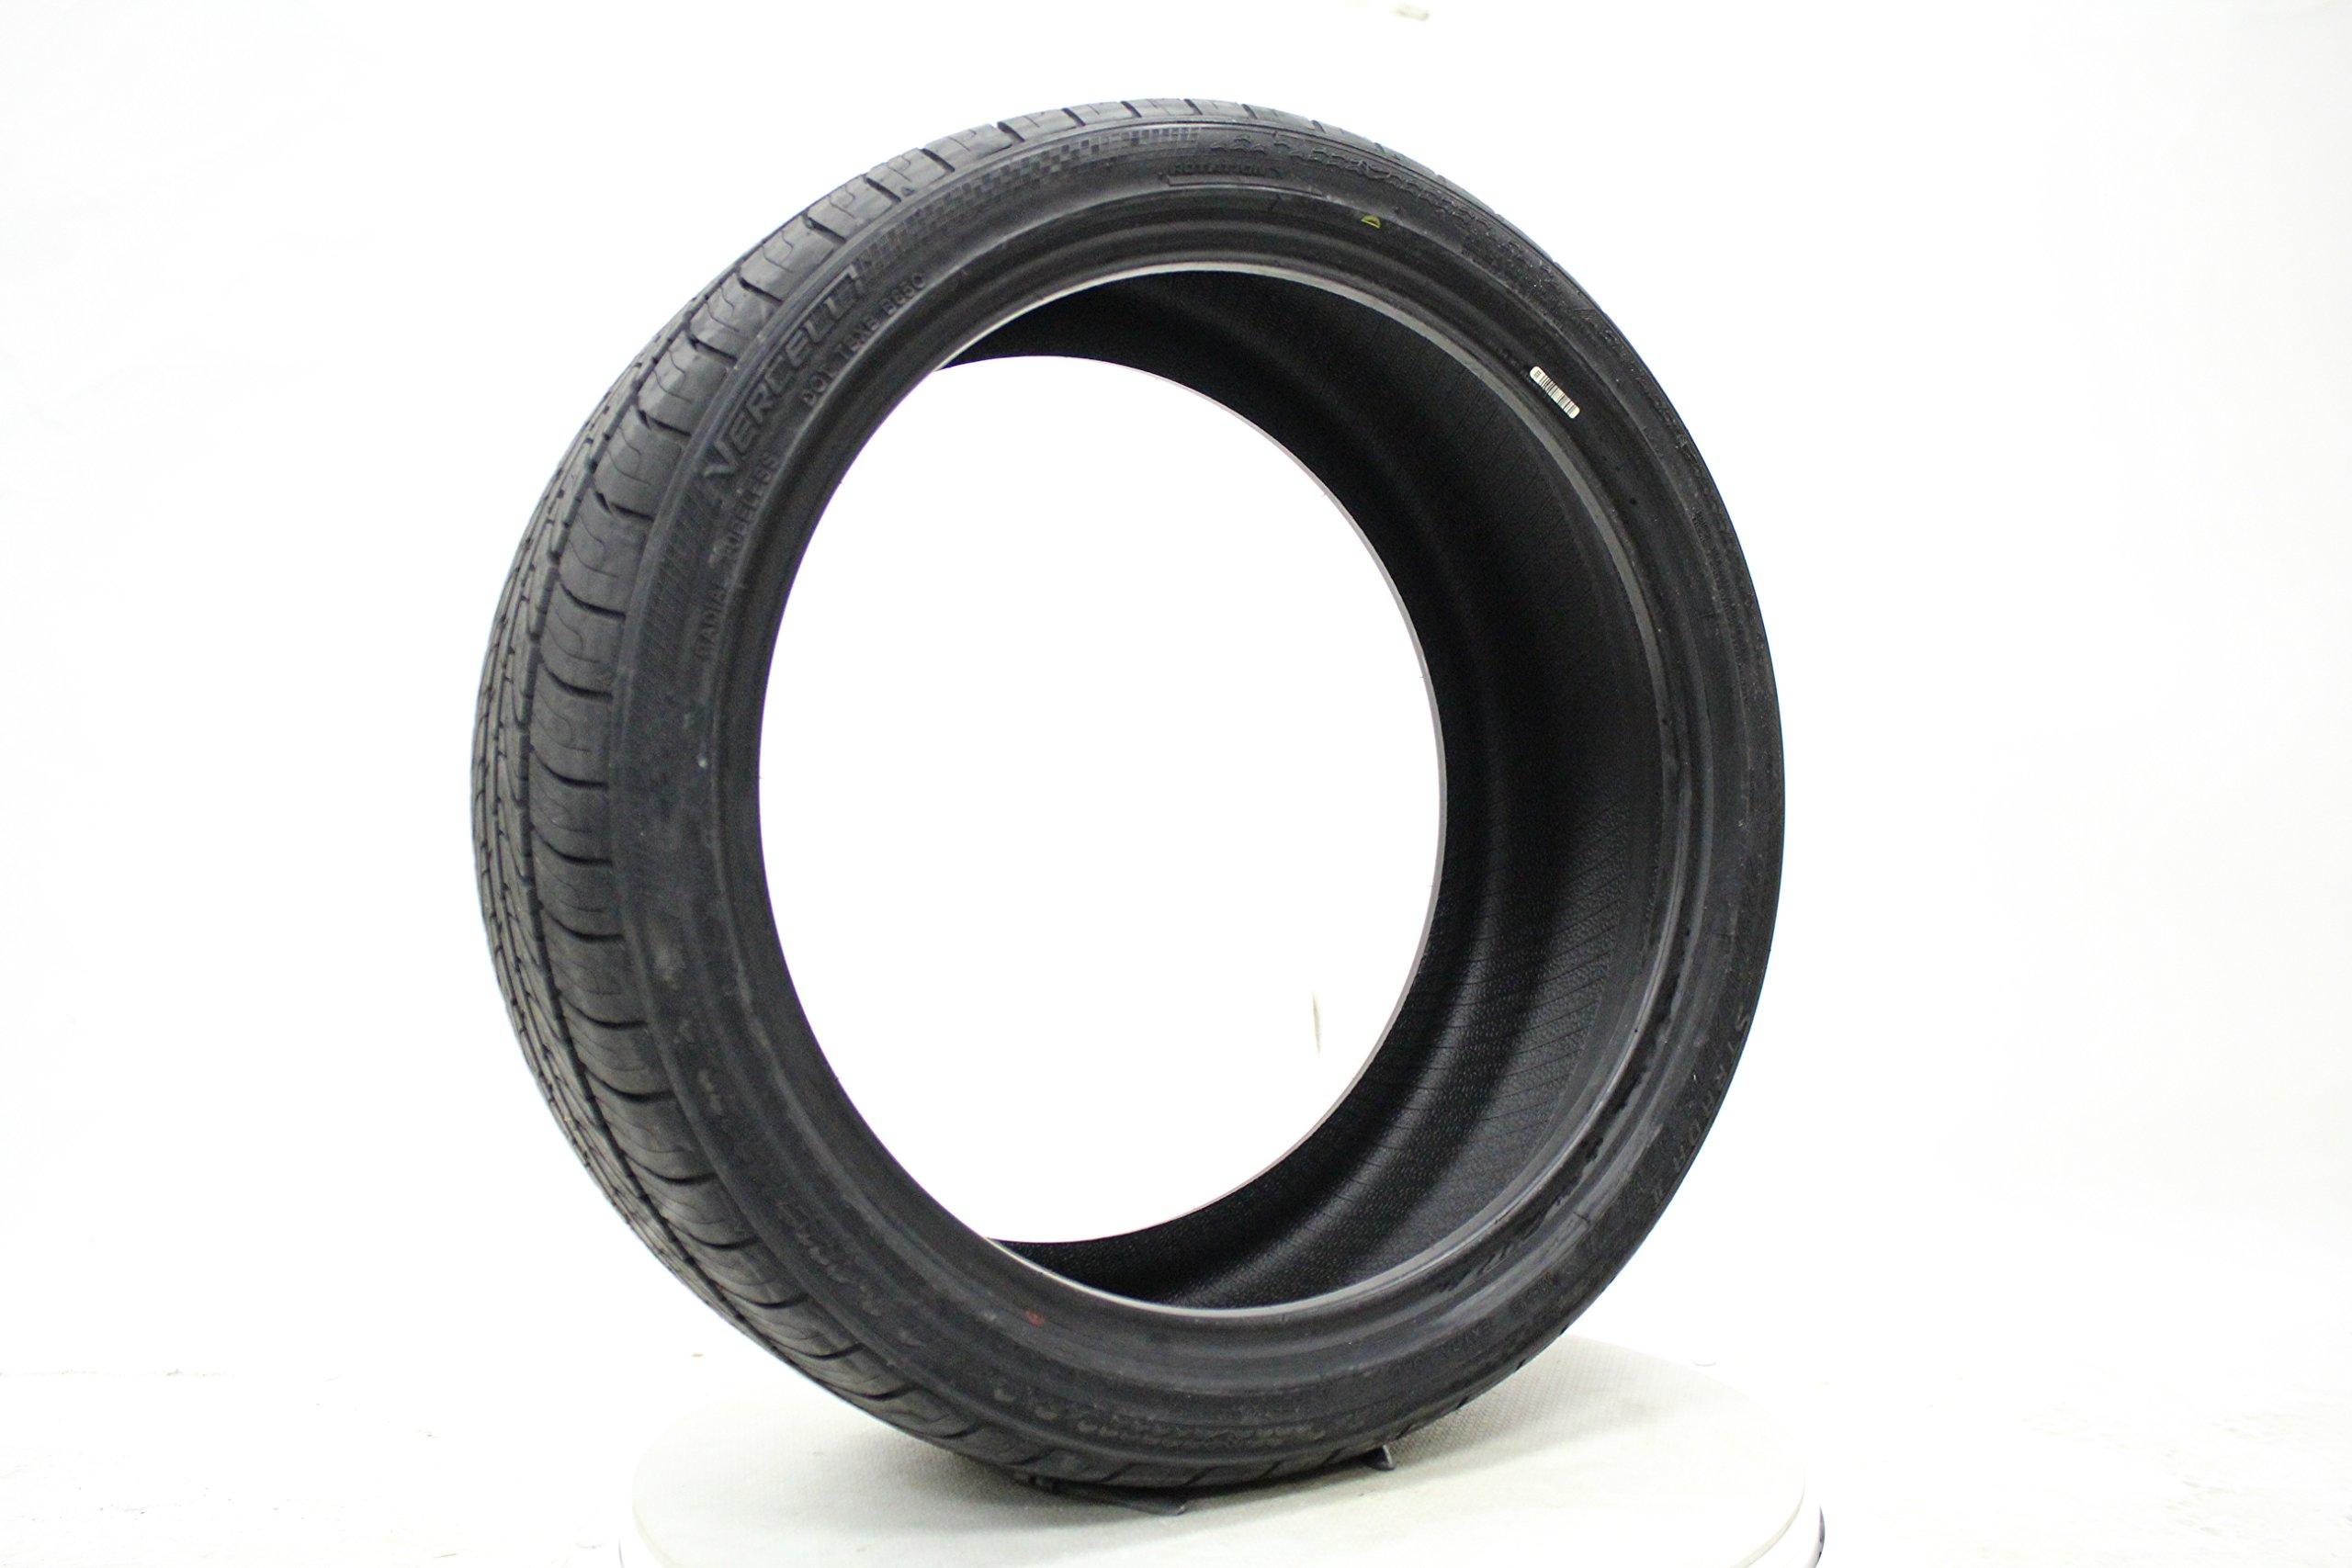 Vercelli Strada II All-Season Radial Tire - 235/45R18 98W by Vercelli (Image #1)